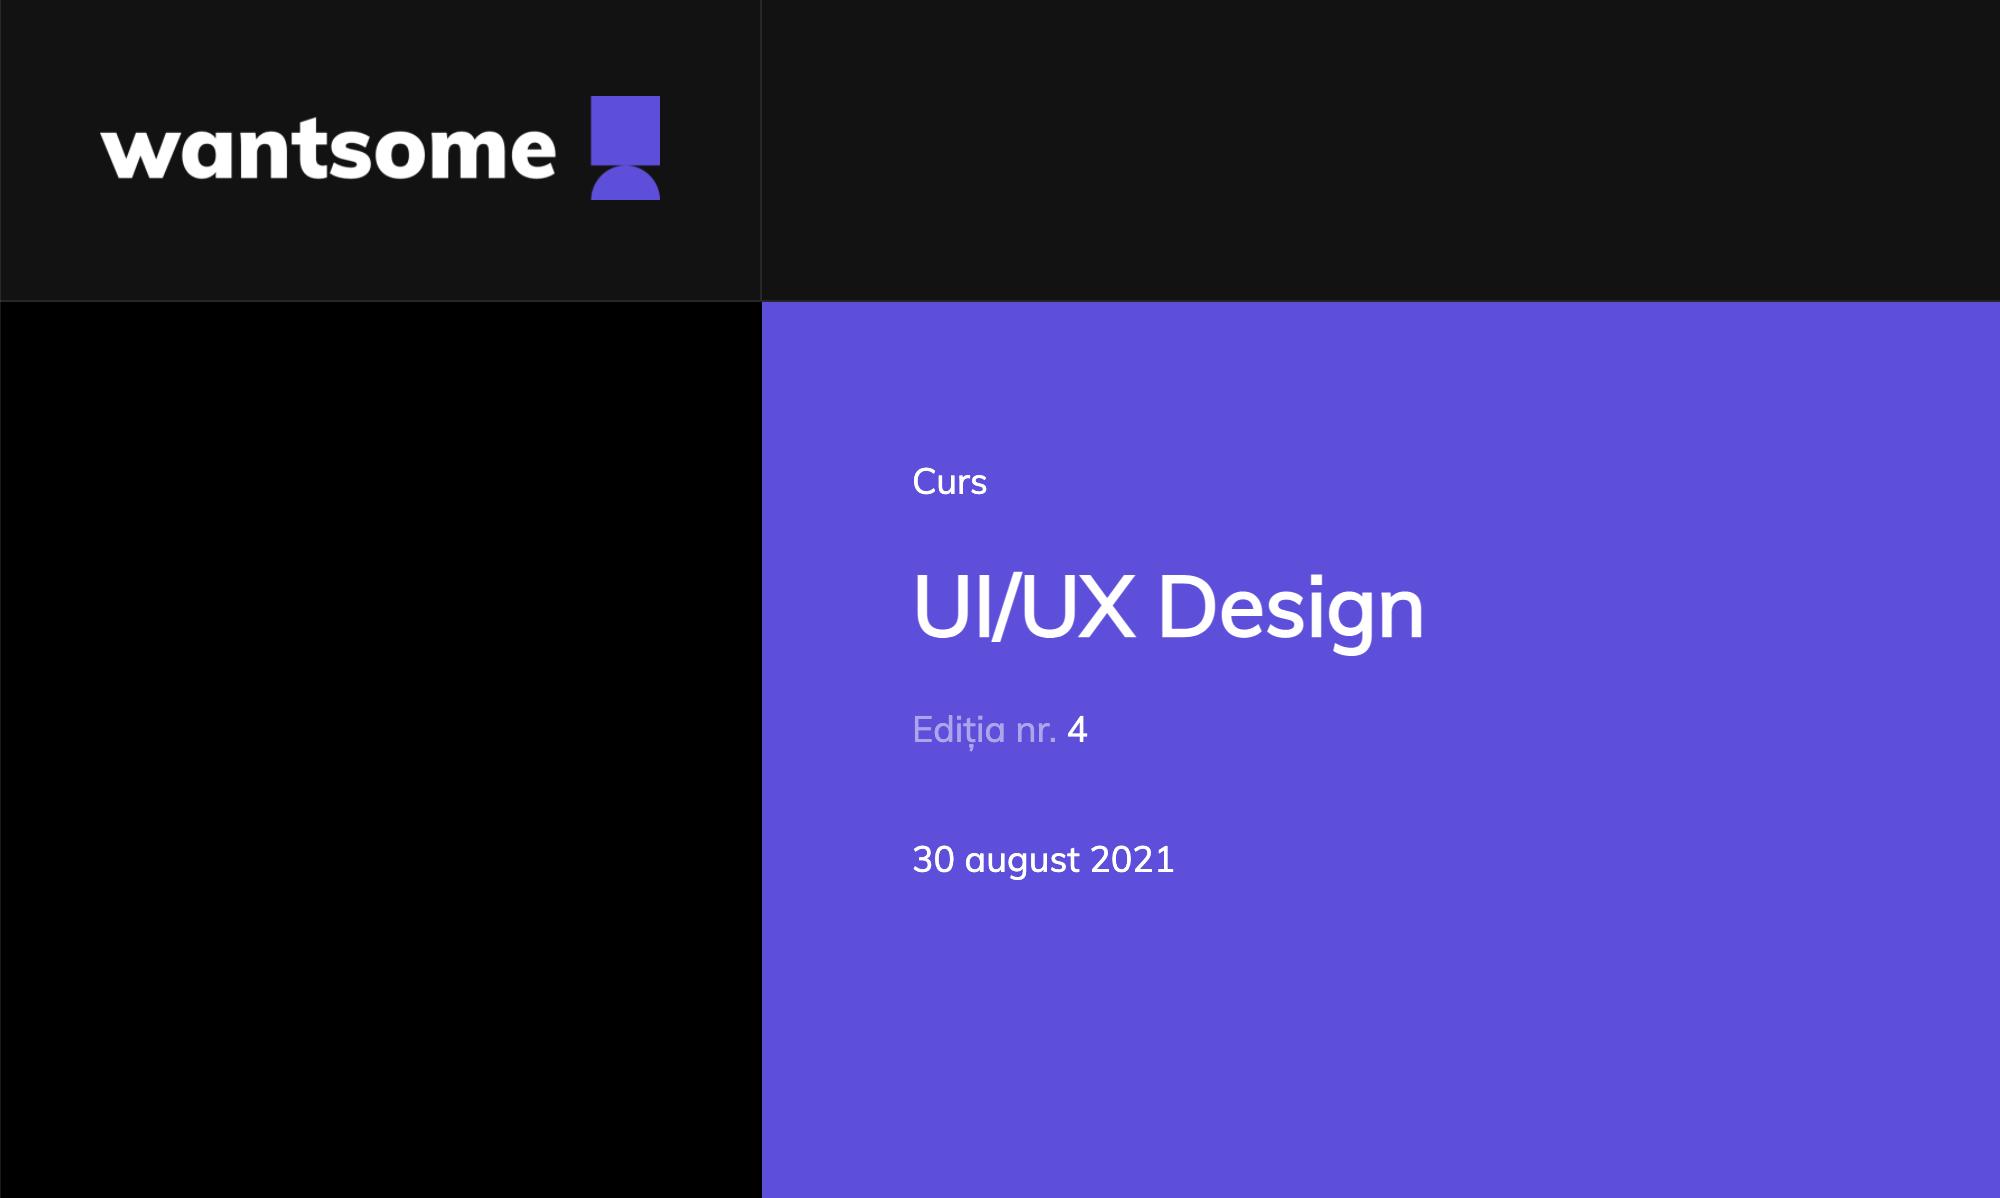 Wantsome – Curs UI/UX